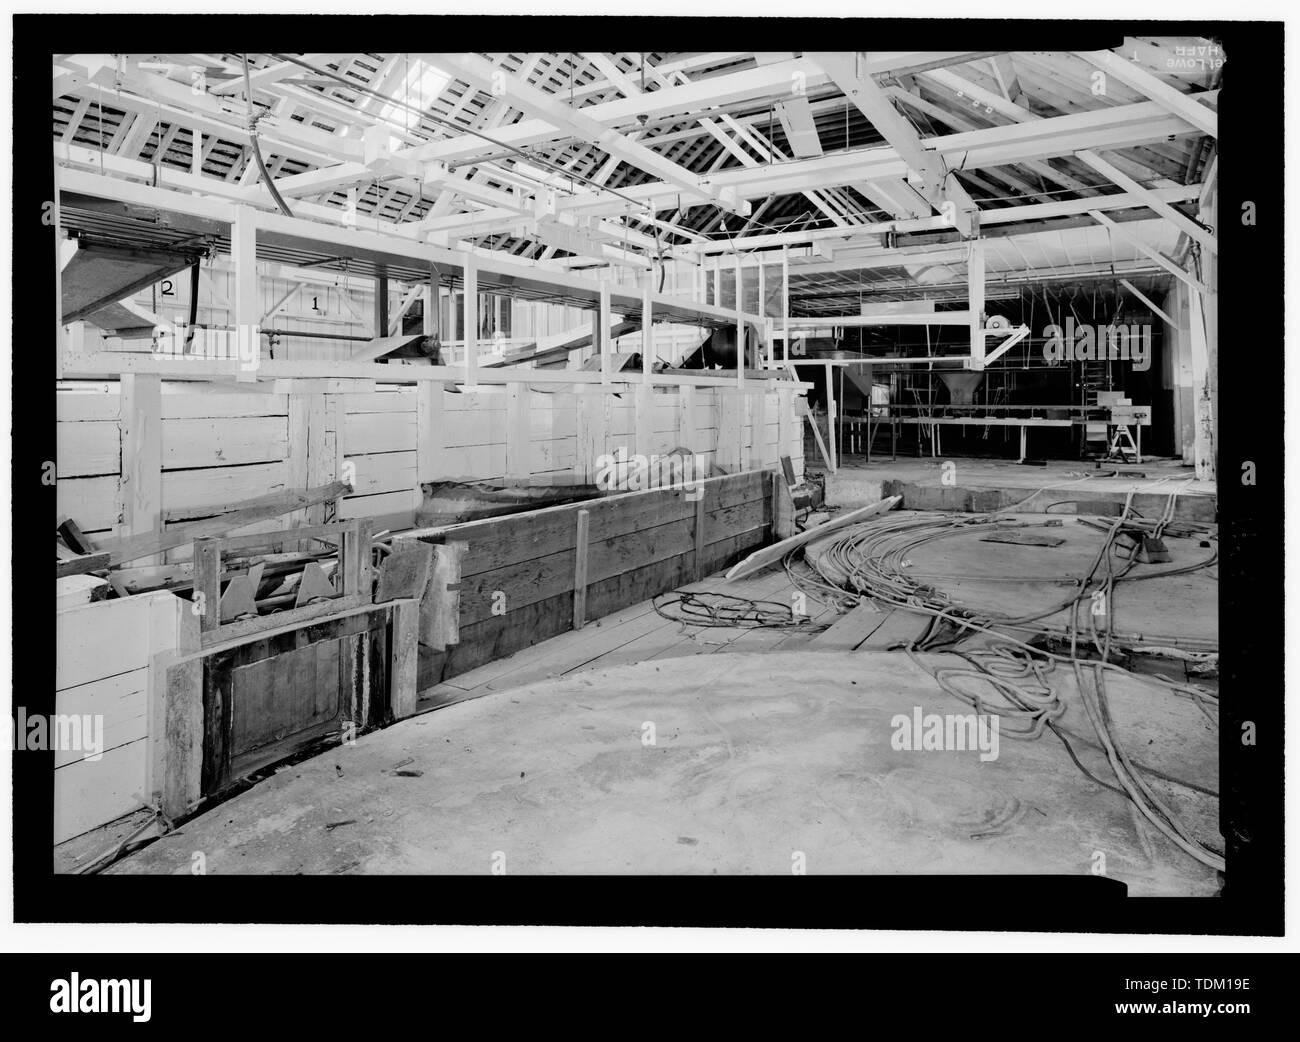 Outlet from holding tanks to storage brine tanks, iron chink in background - Kake Salmon Cannery, 540 Keku Road, Kake, Wrangell-Petersburg Census Area, AK - Stock Image